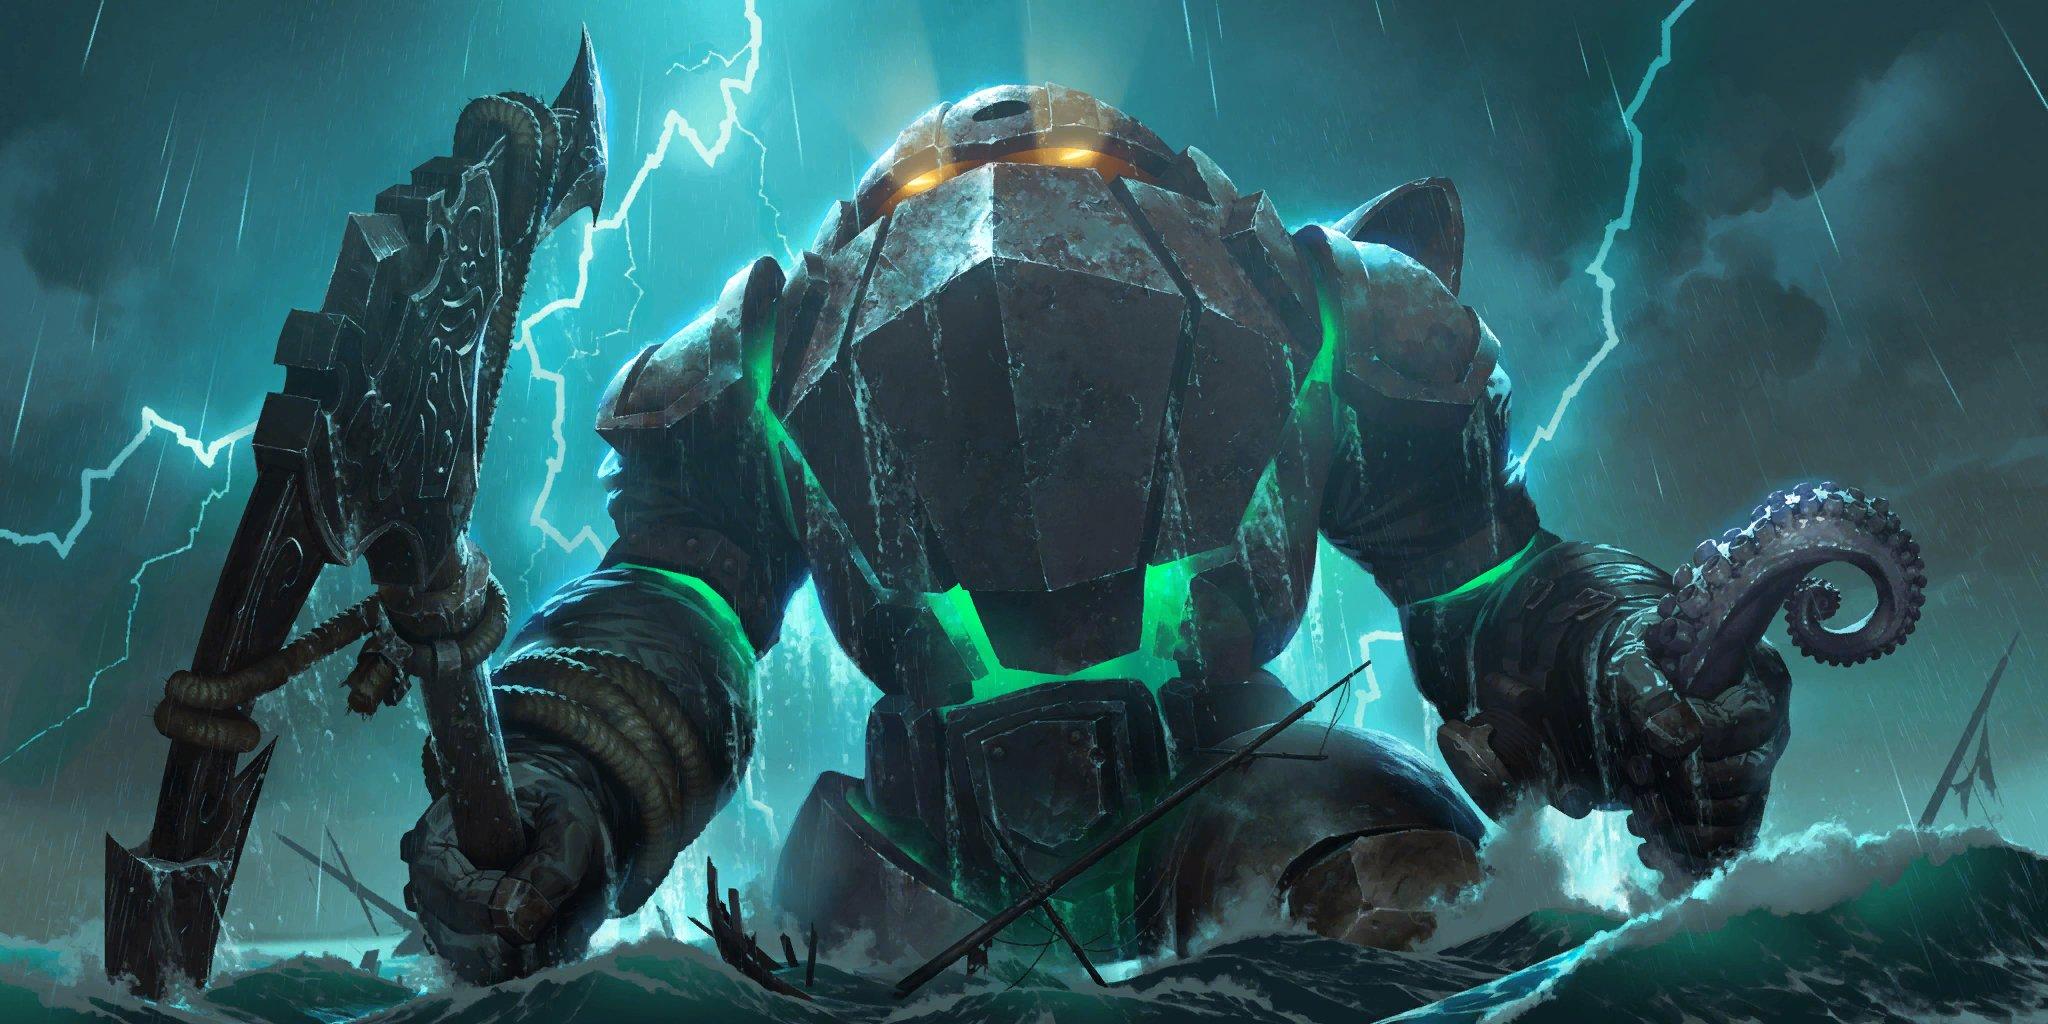 Nautilus Legends of Runeterra Level 2 LOR - Lore Power Level Analysis: Lillia, the Bashful Bloom